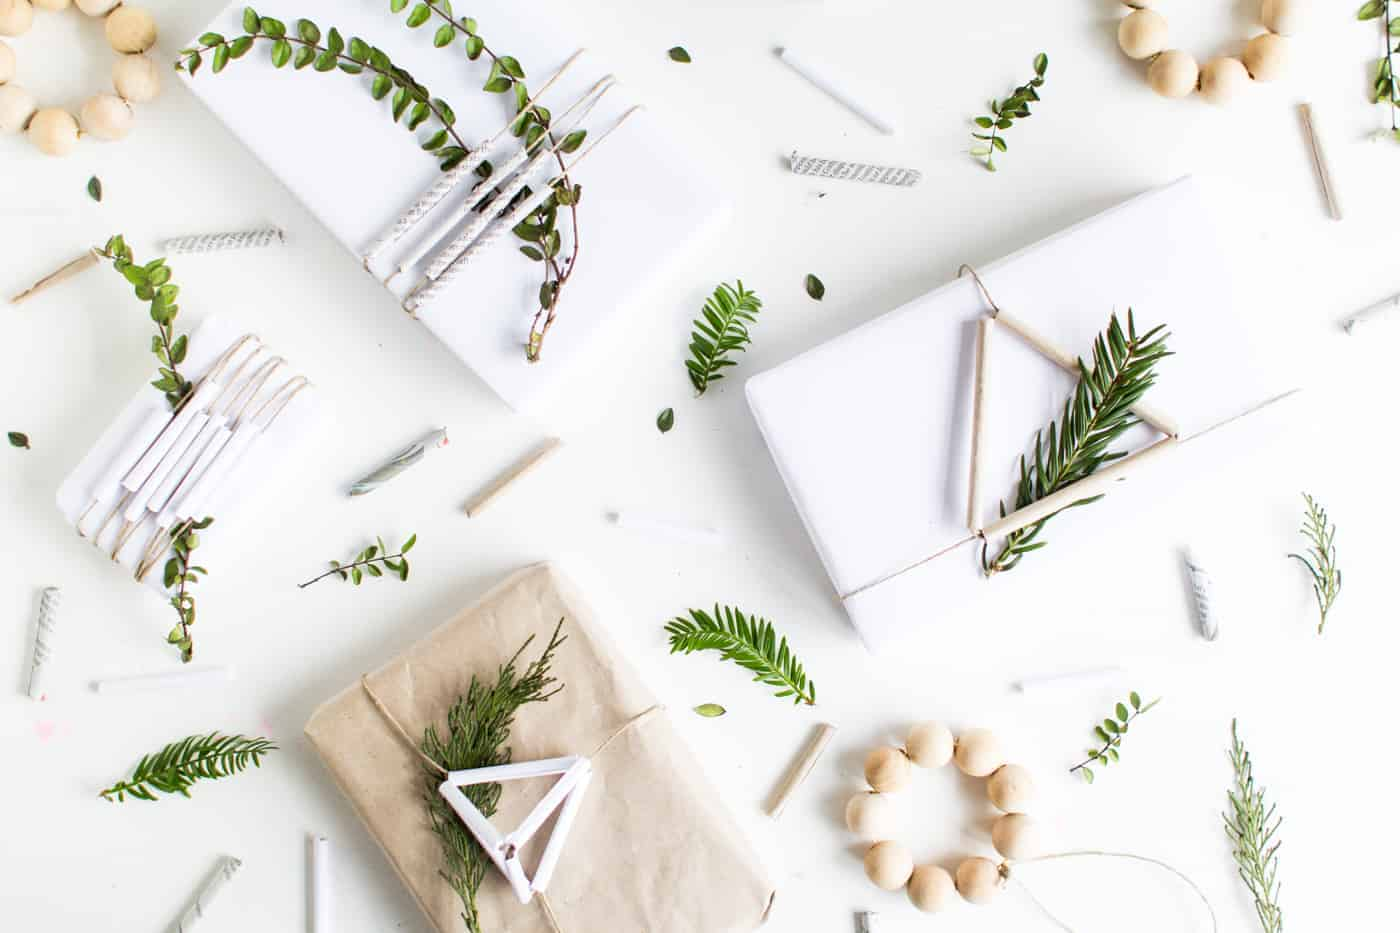 Diy Paper Straw Gift Wrap Toppers @fallfordiy 13